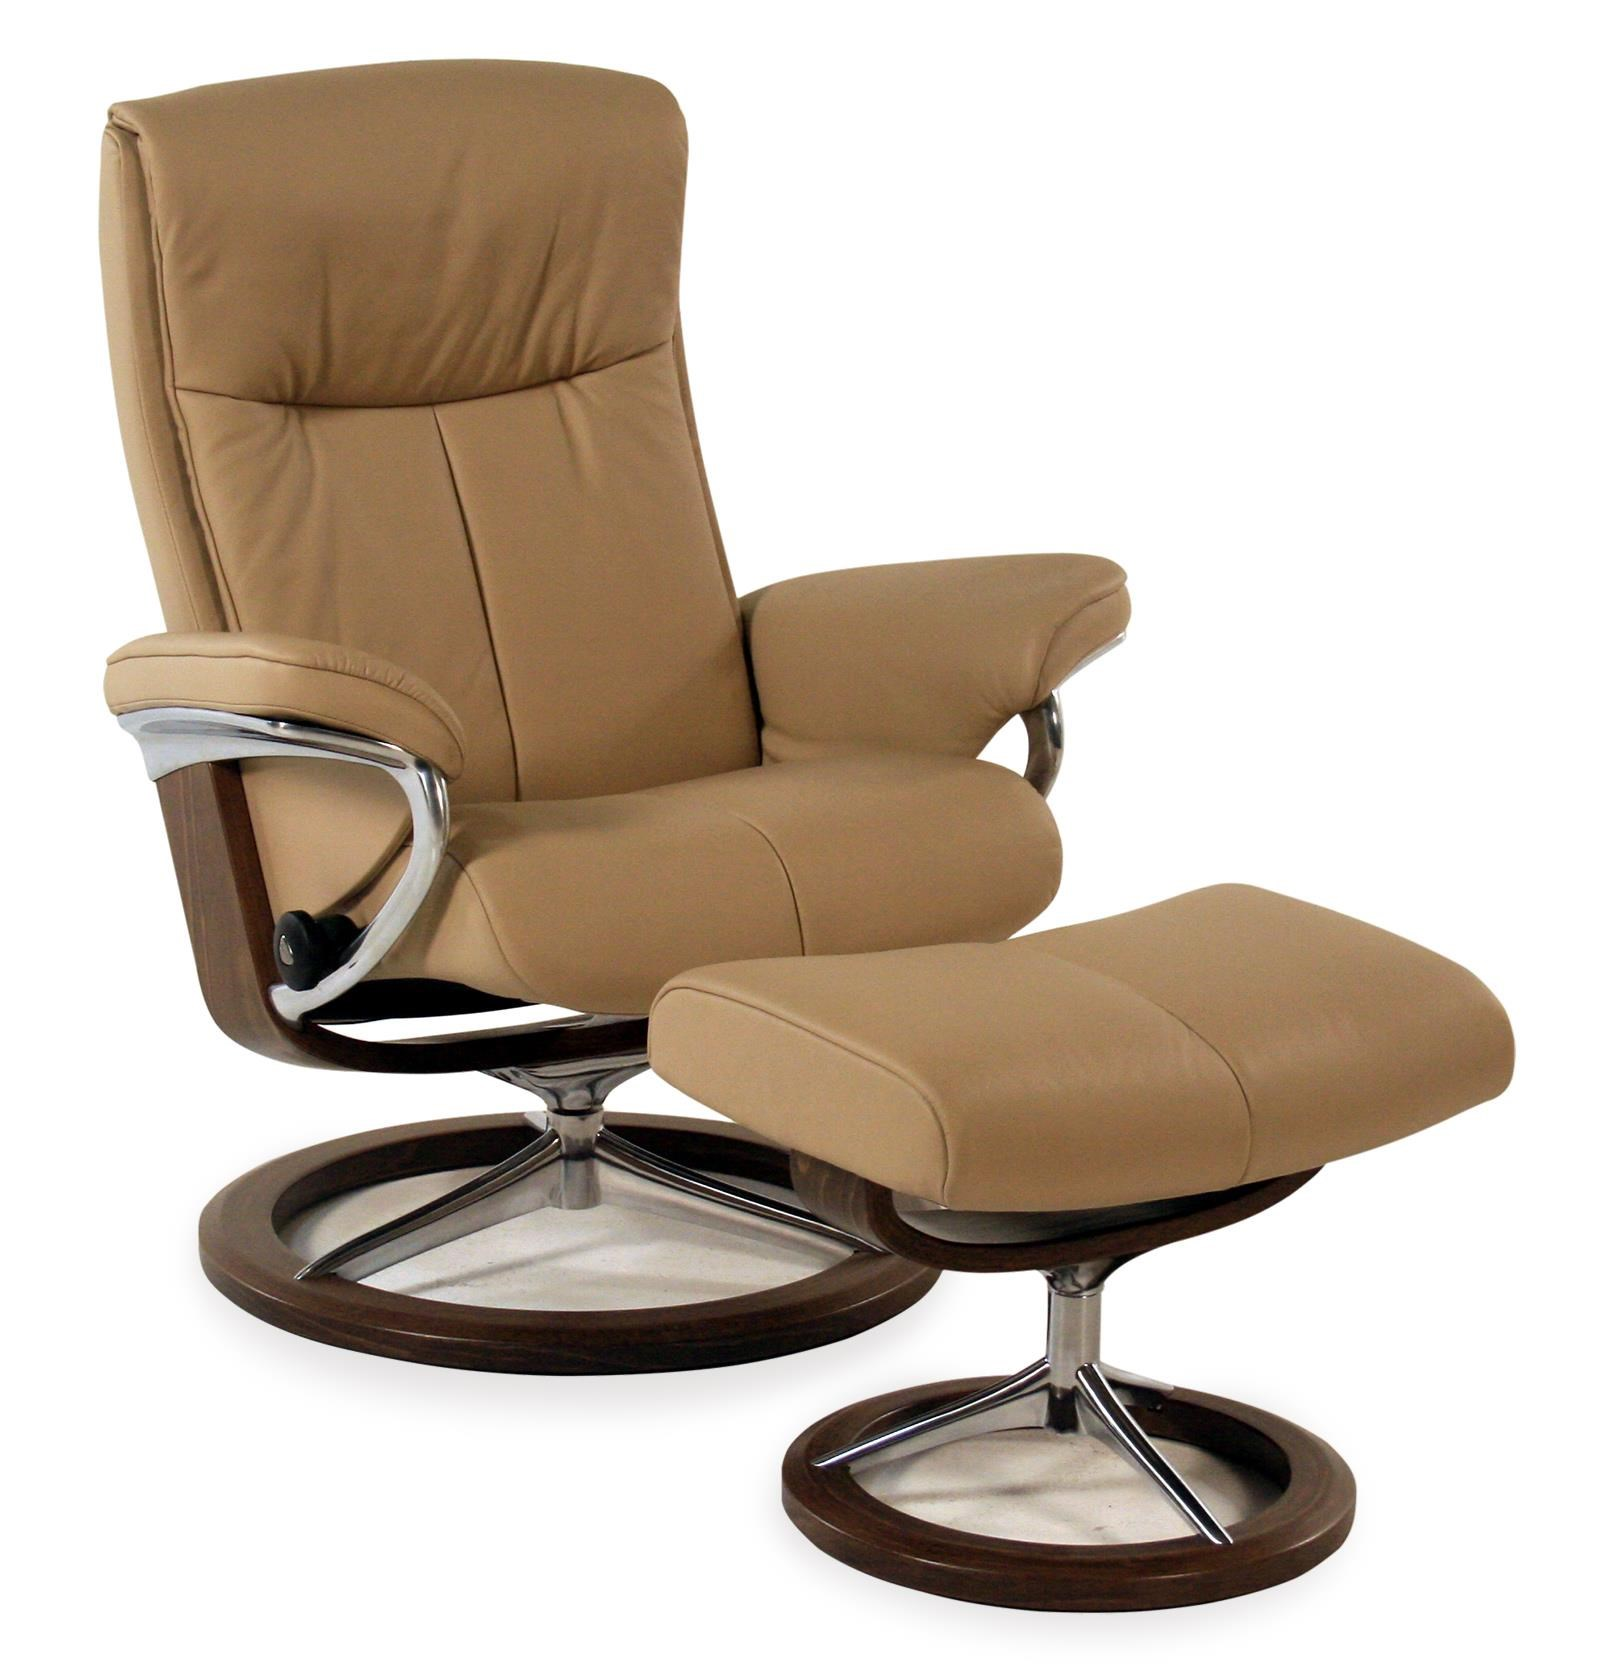 Medium Signature Chair & Ottoman